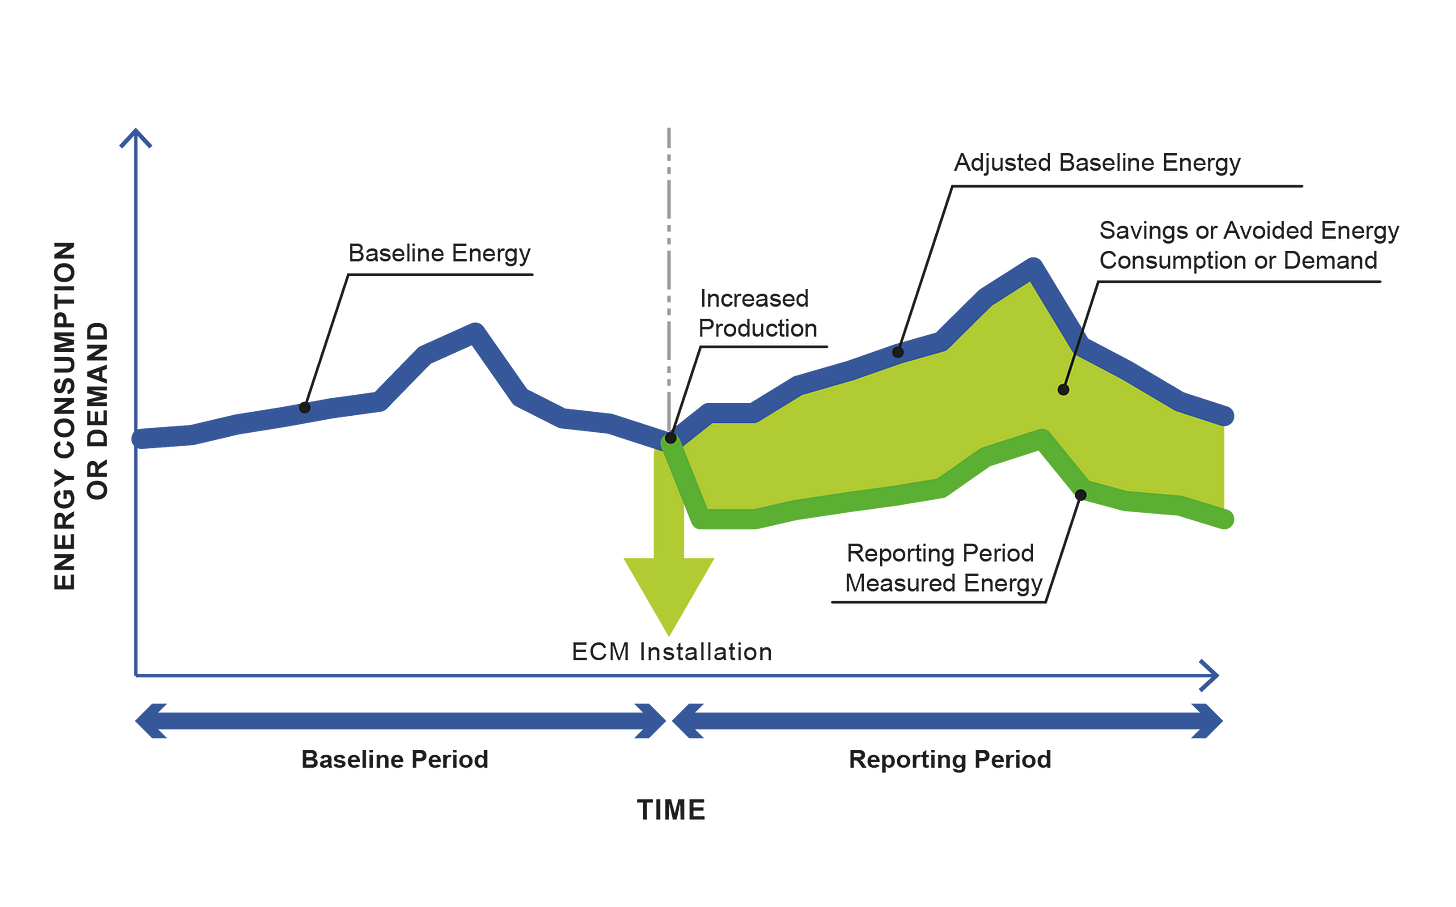 IPMVP - Efficiency Valuation Organization (EVO)